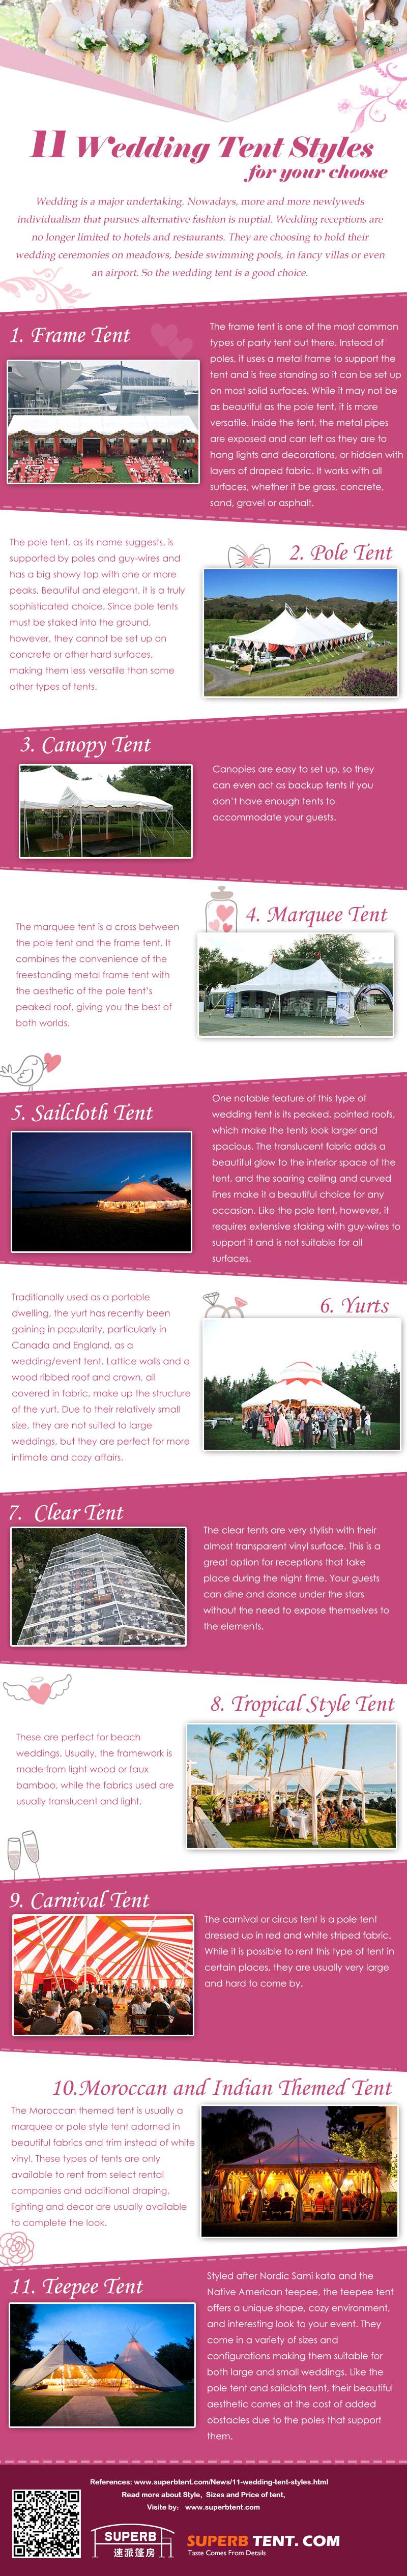 11-wedding-tent-styles-infographic-plaza